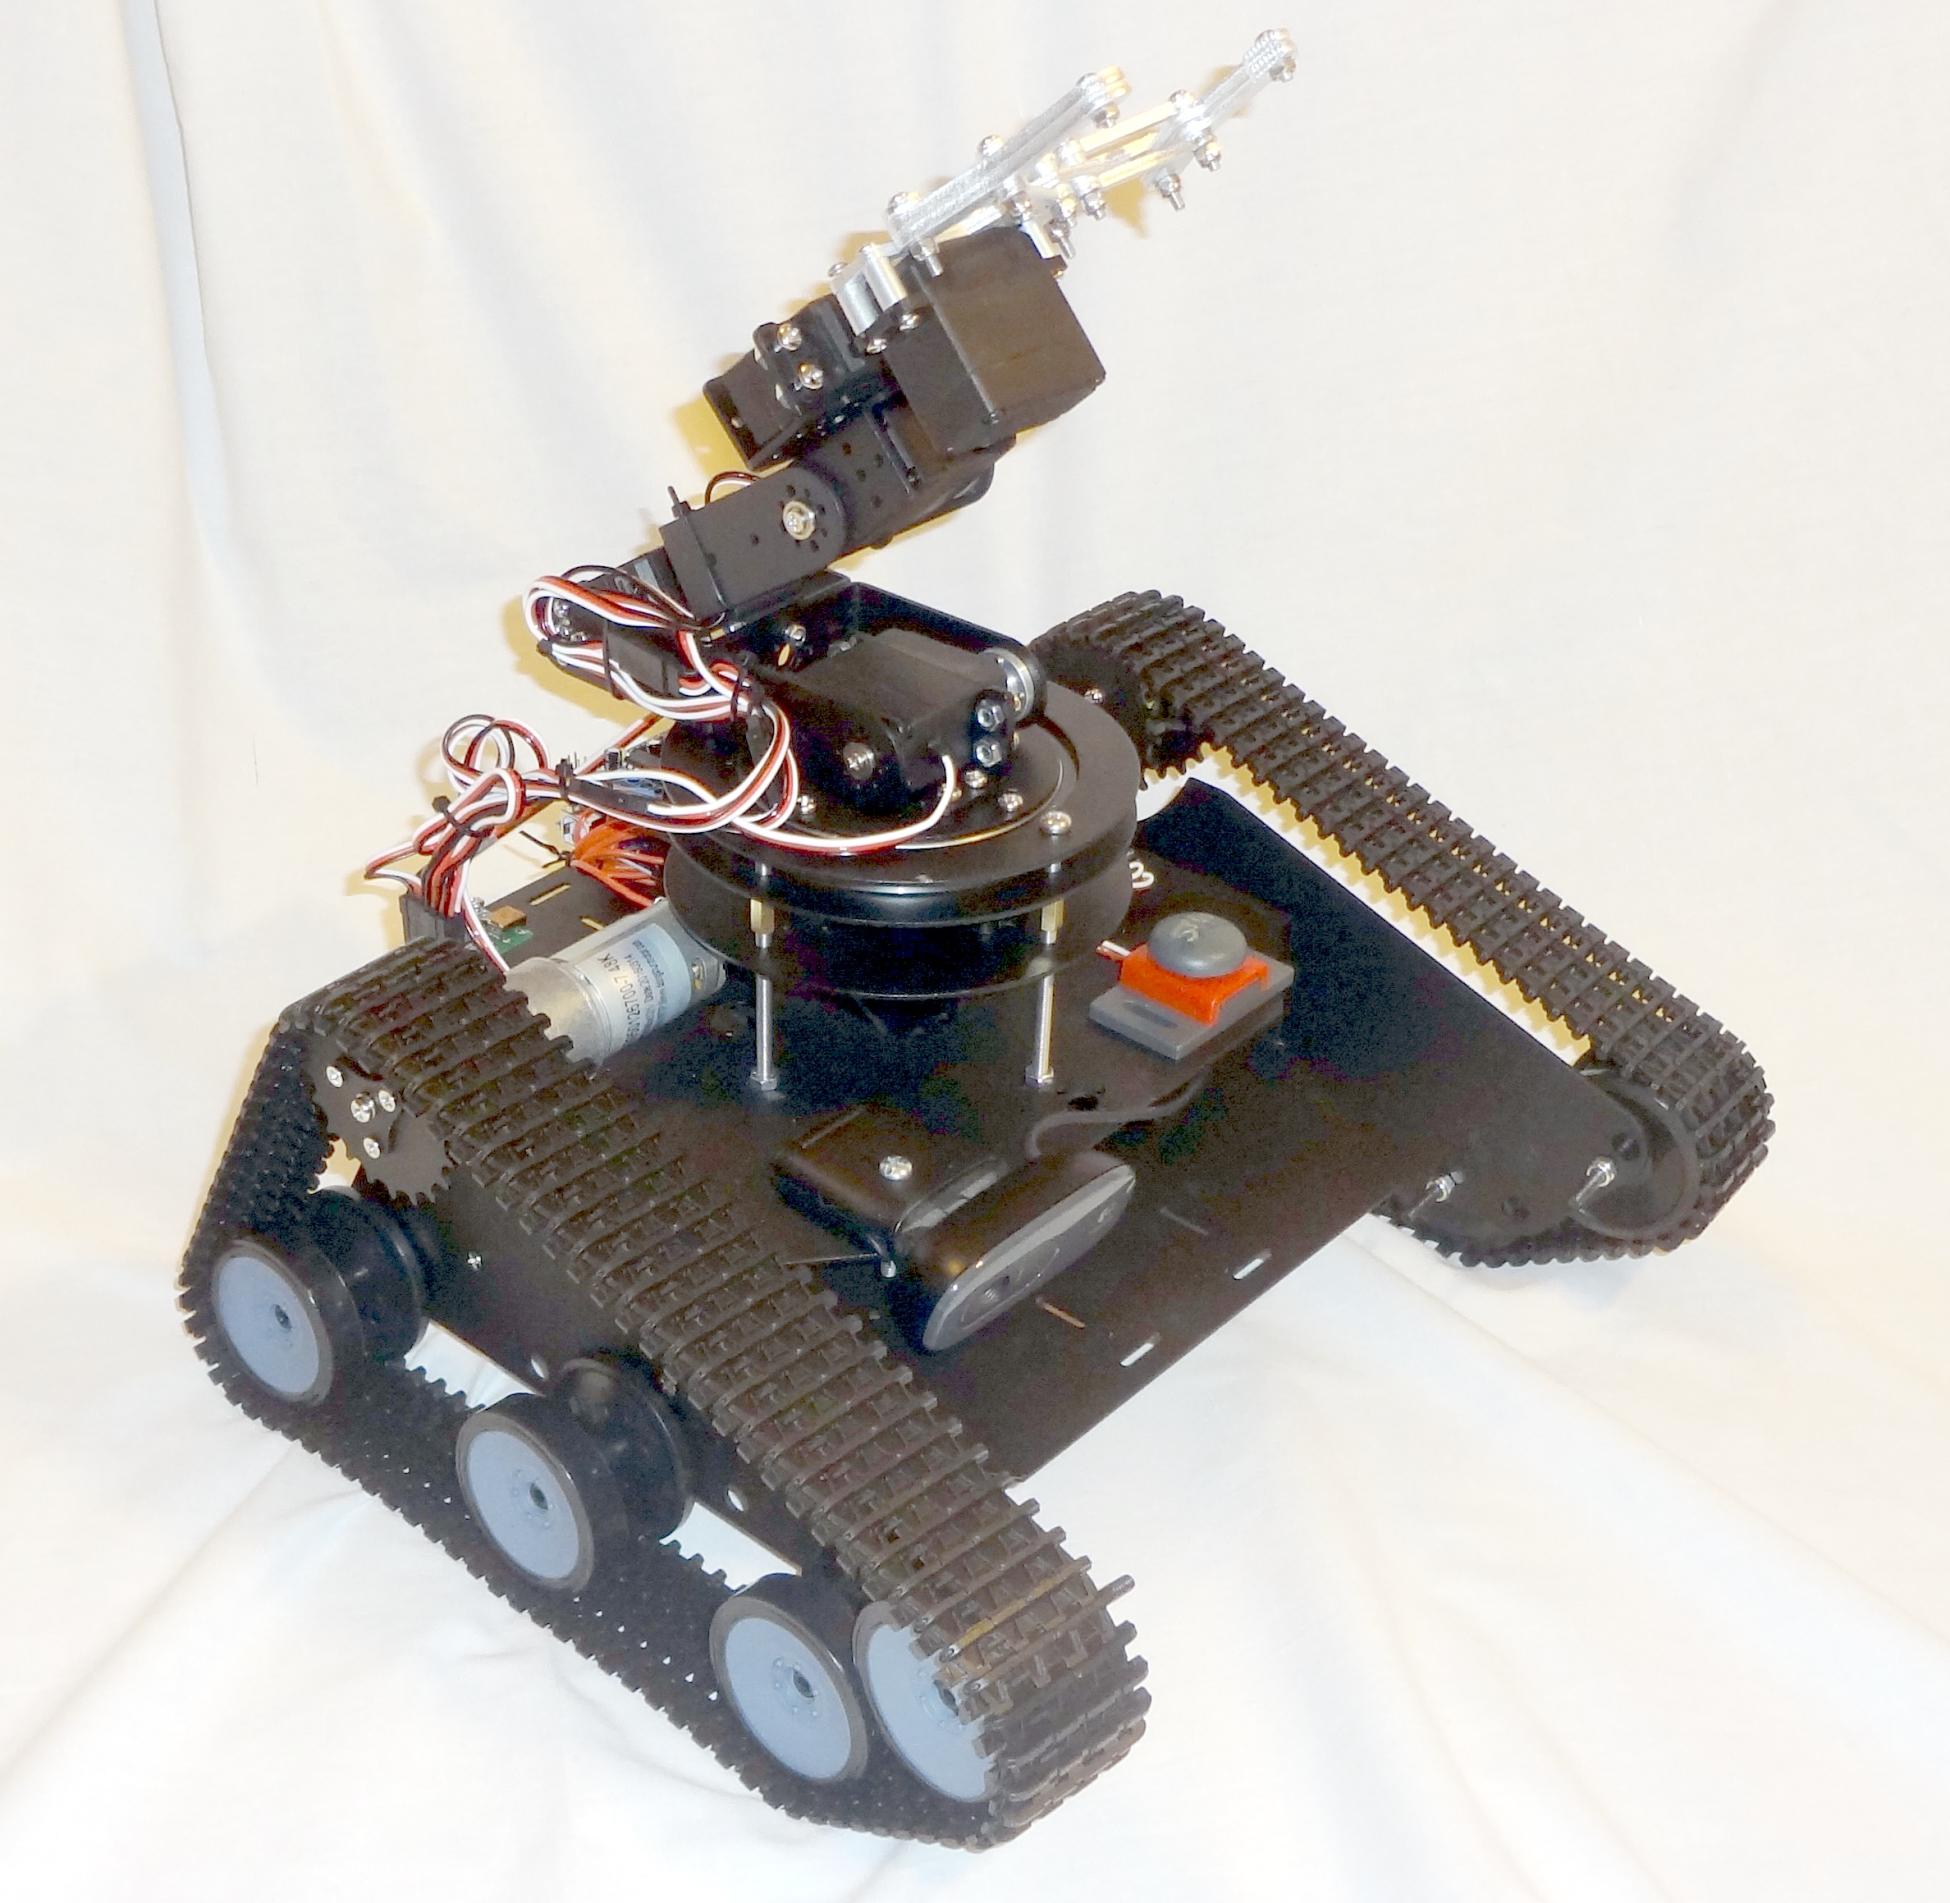 The basic principle of robotics and AI - Artificial